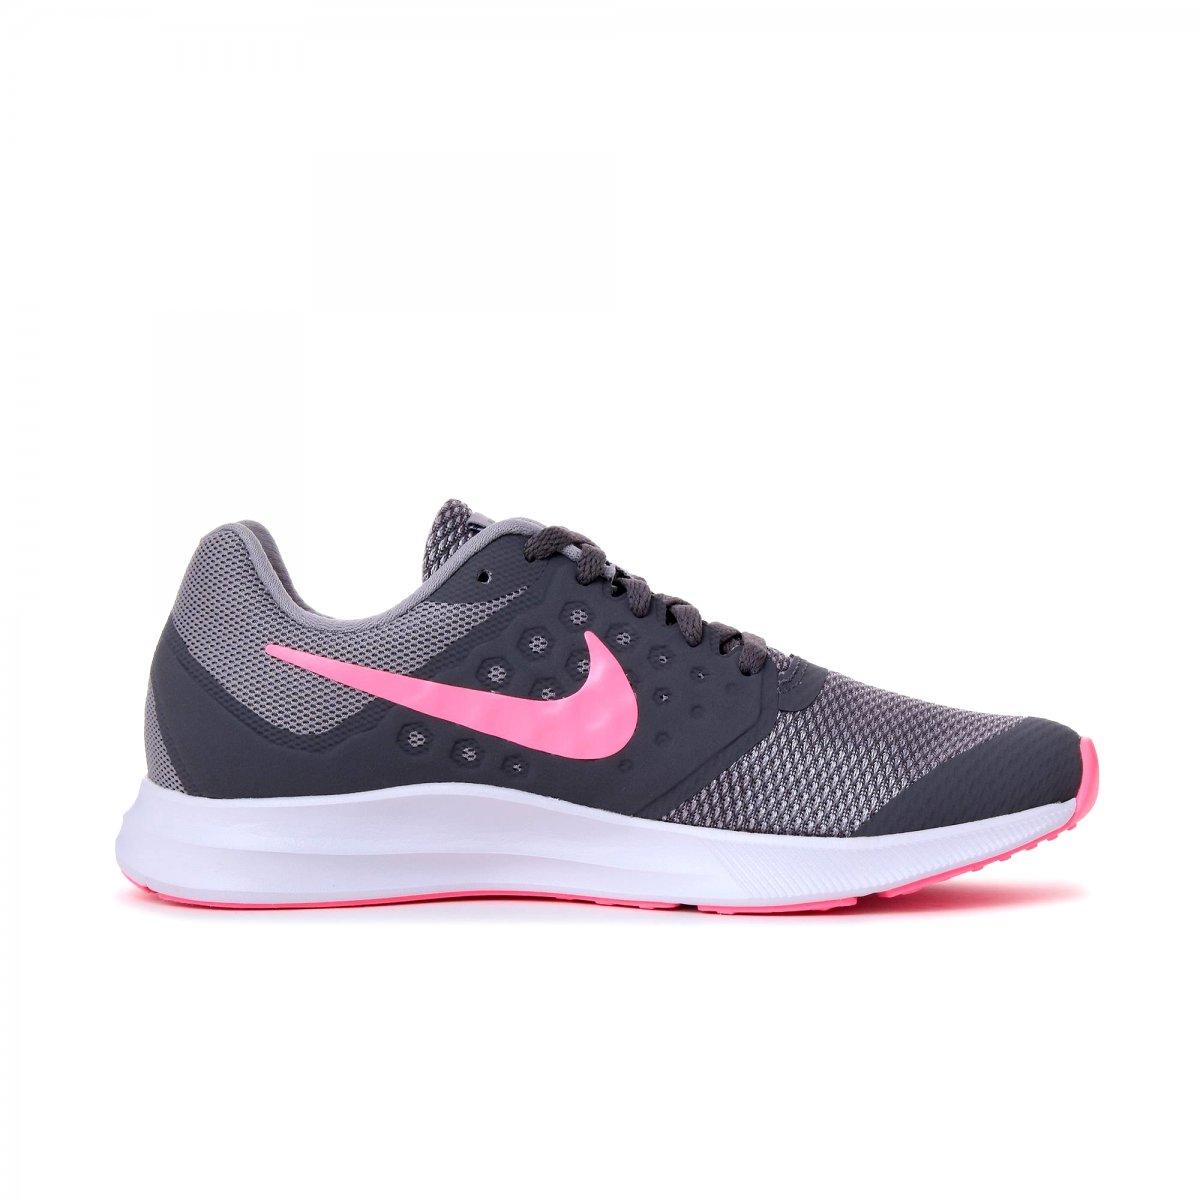 44f5a55b93 Tênis Infantil Nike Downshifter 7 (GS) 869972-003 - Cinza/Rosa ...